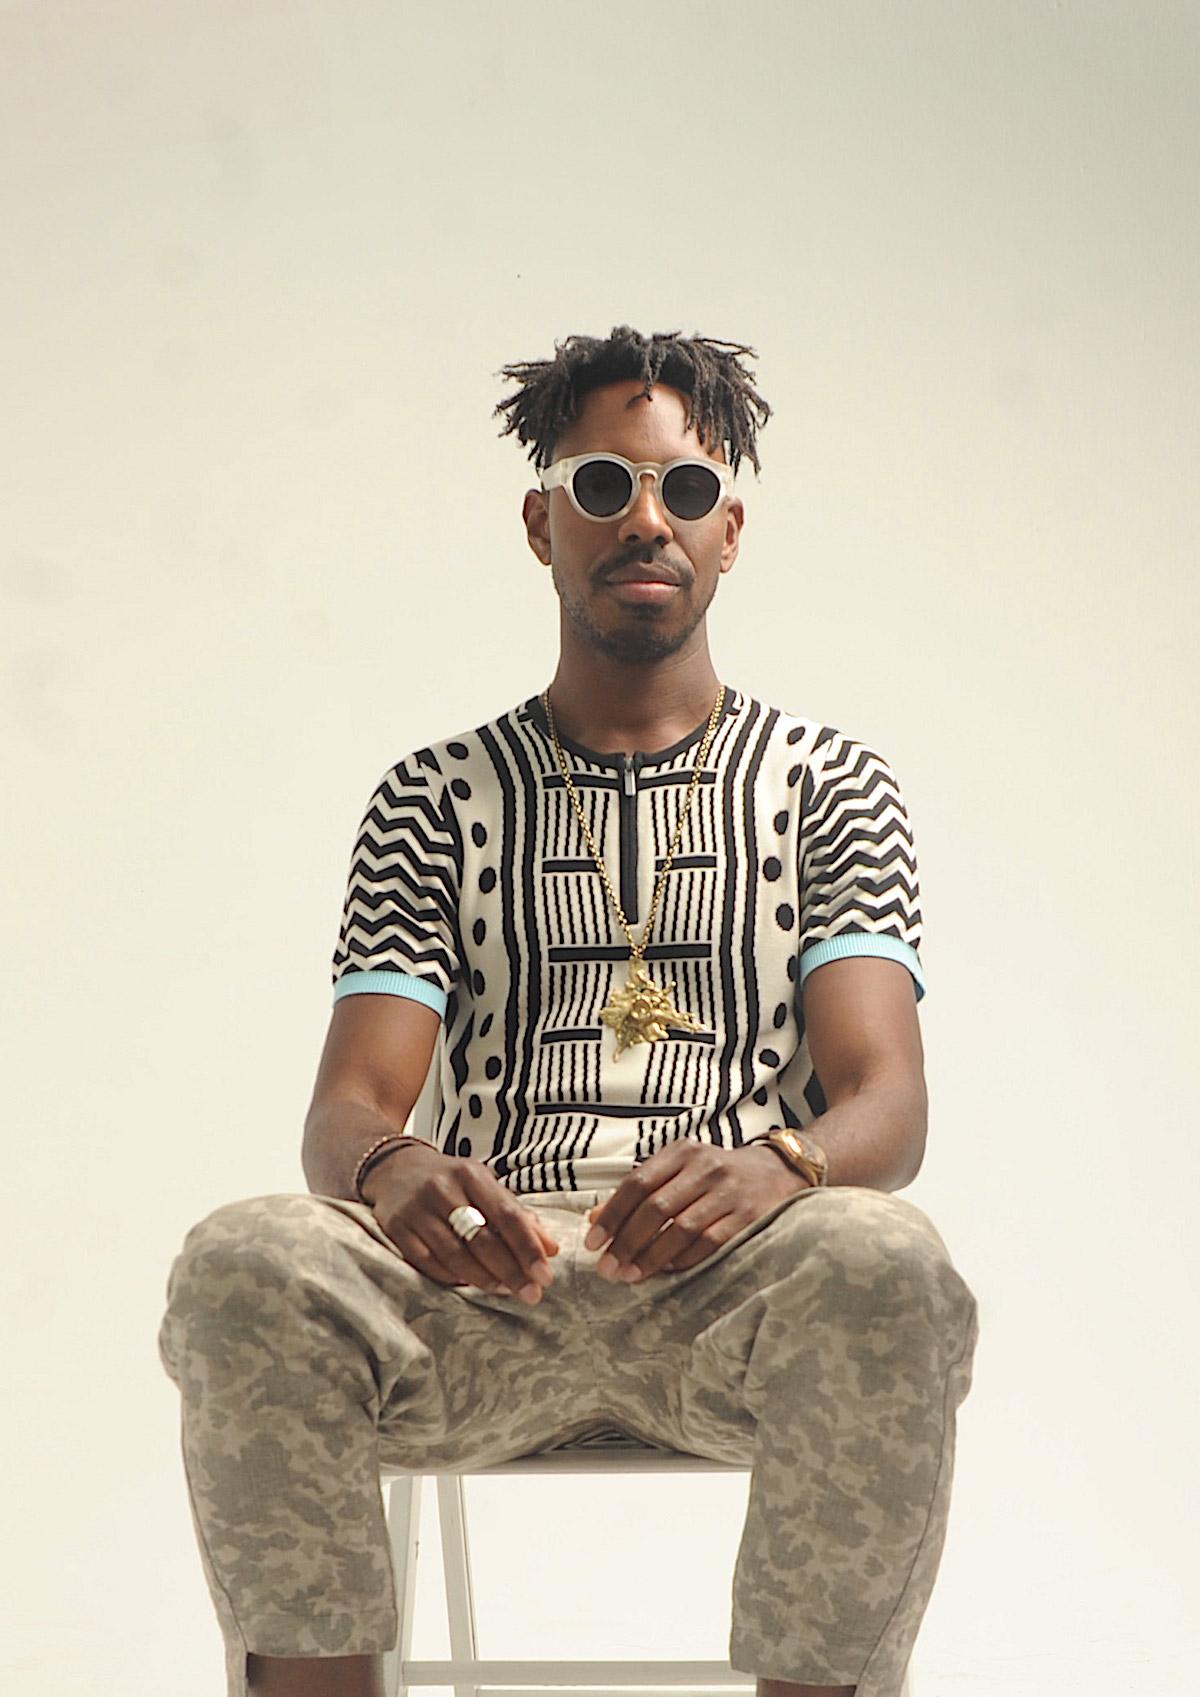 Shabaka Hutchings, Sons of Kemet, Shabaka and the Ancestors, The Brother Moves On, African Jazz, African Musicians, African Art, KOLUMN Magazine, KOLUMN